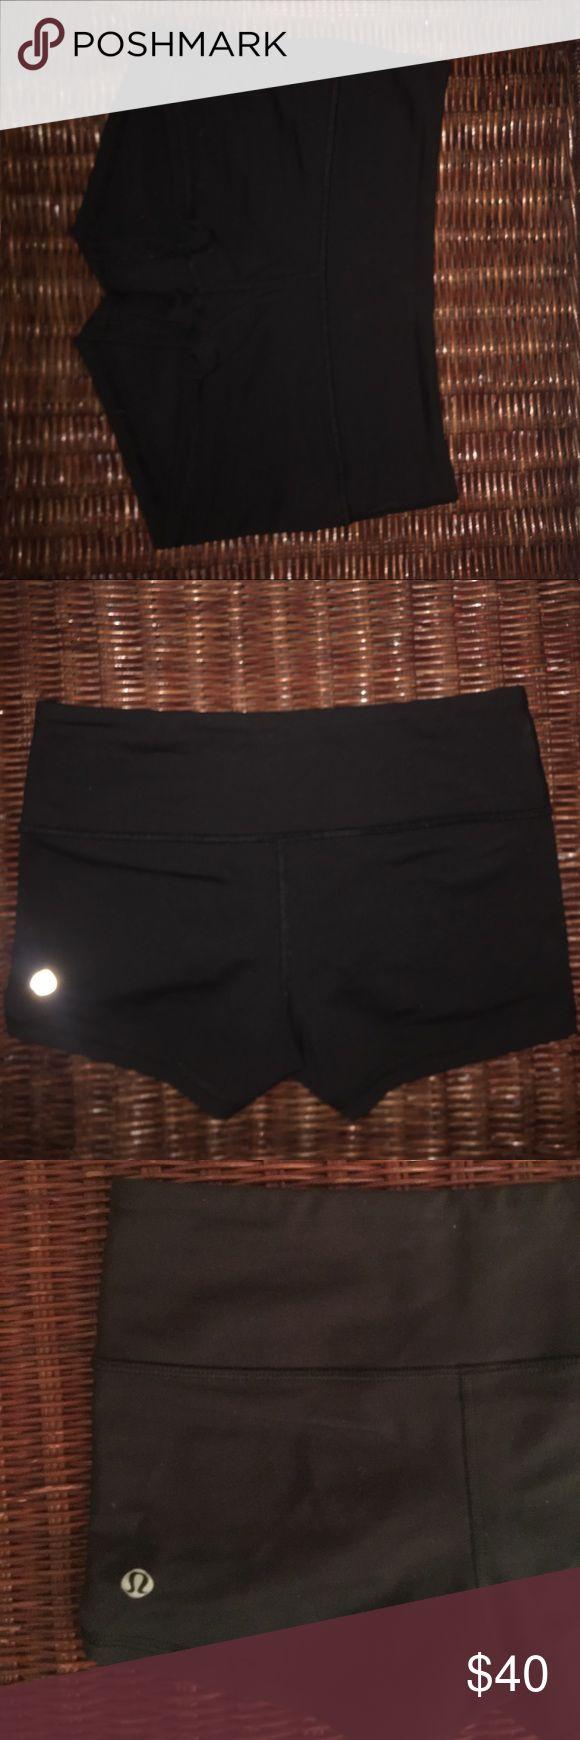 Lulu spandex shorts size 4 - worn once Lulu spandex shorts size 4- worn once lululemon athletica Shorts